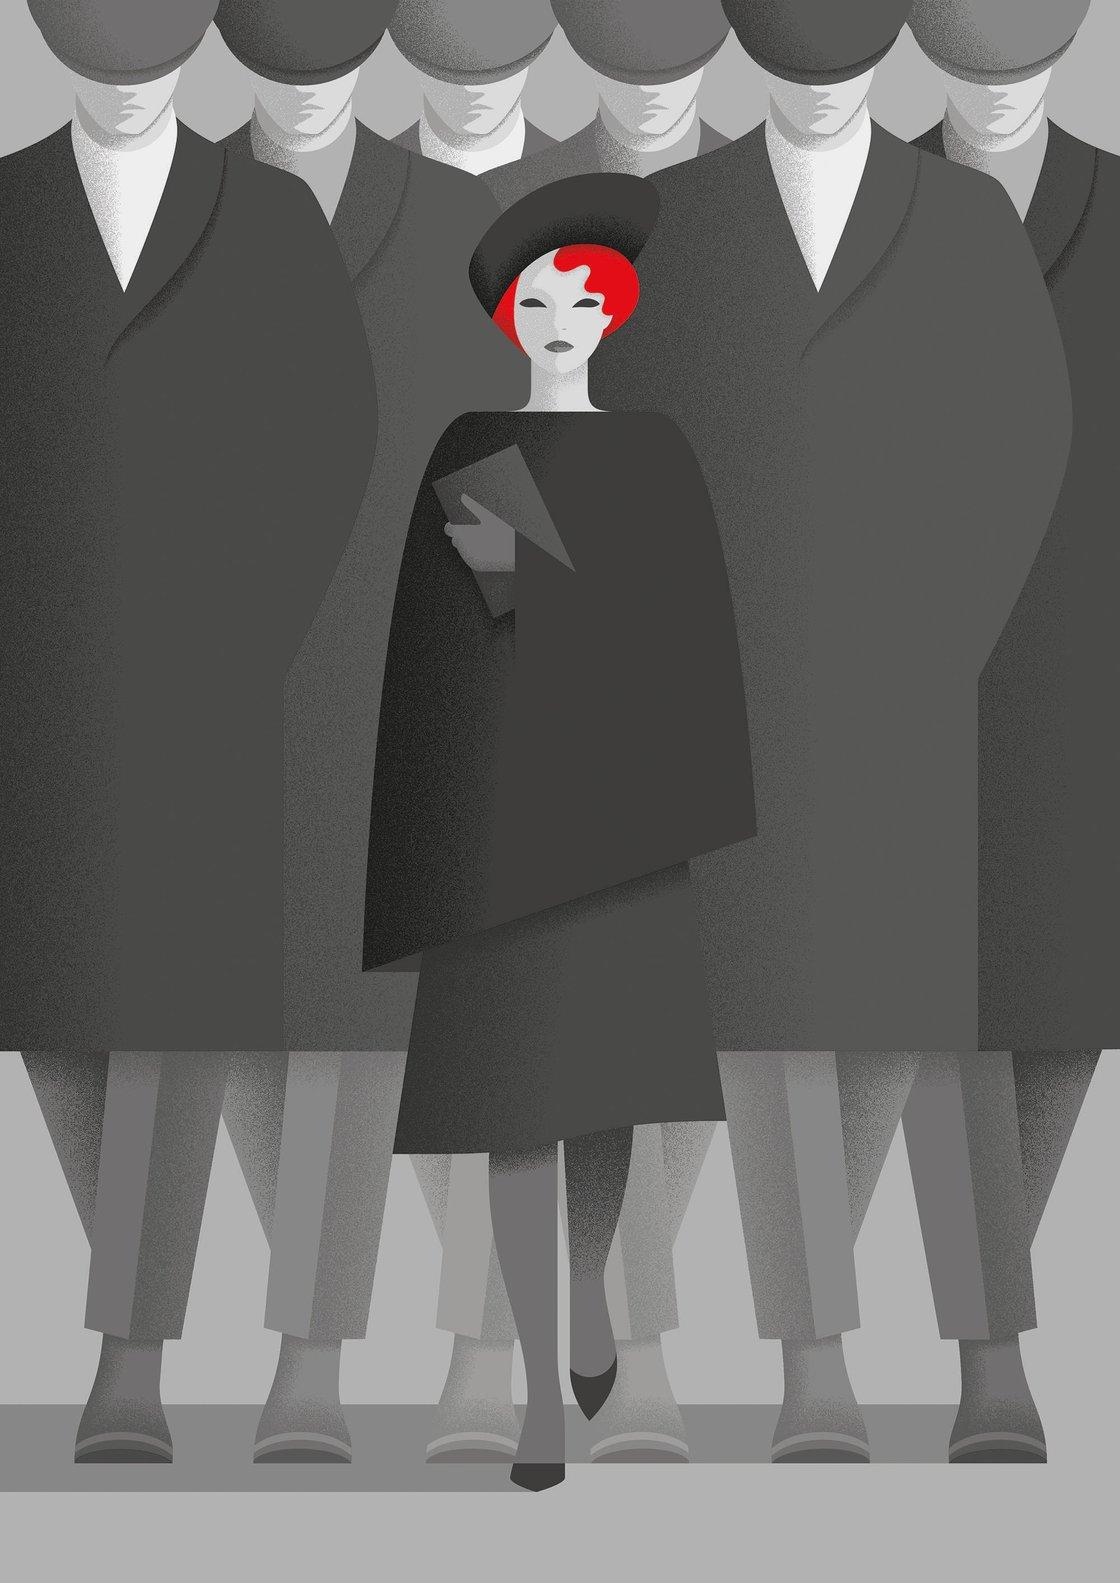 Image of Ellen Wilkinson by Deanna Halsall